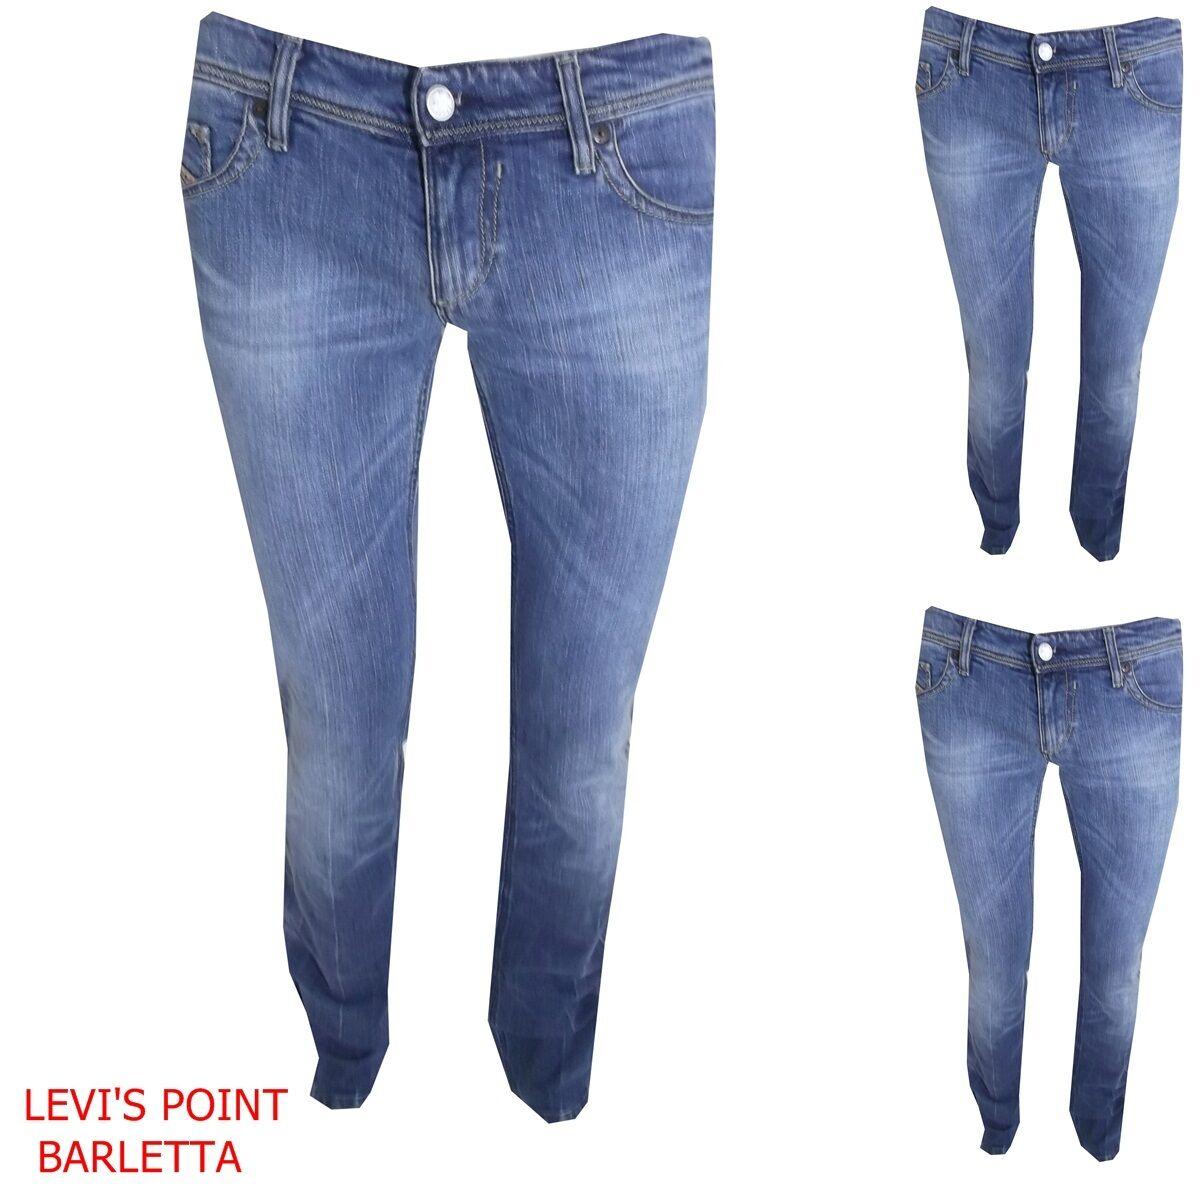 Jeans diesel lowky stretch slim diritto azzurro taglia W 27 27 27 28 29 30 31 32 cd9068